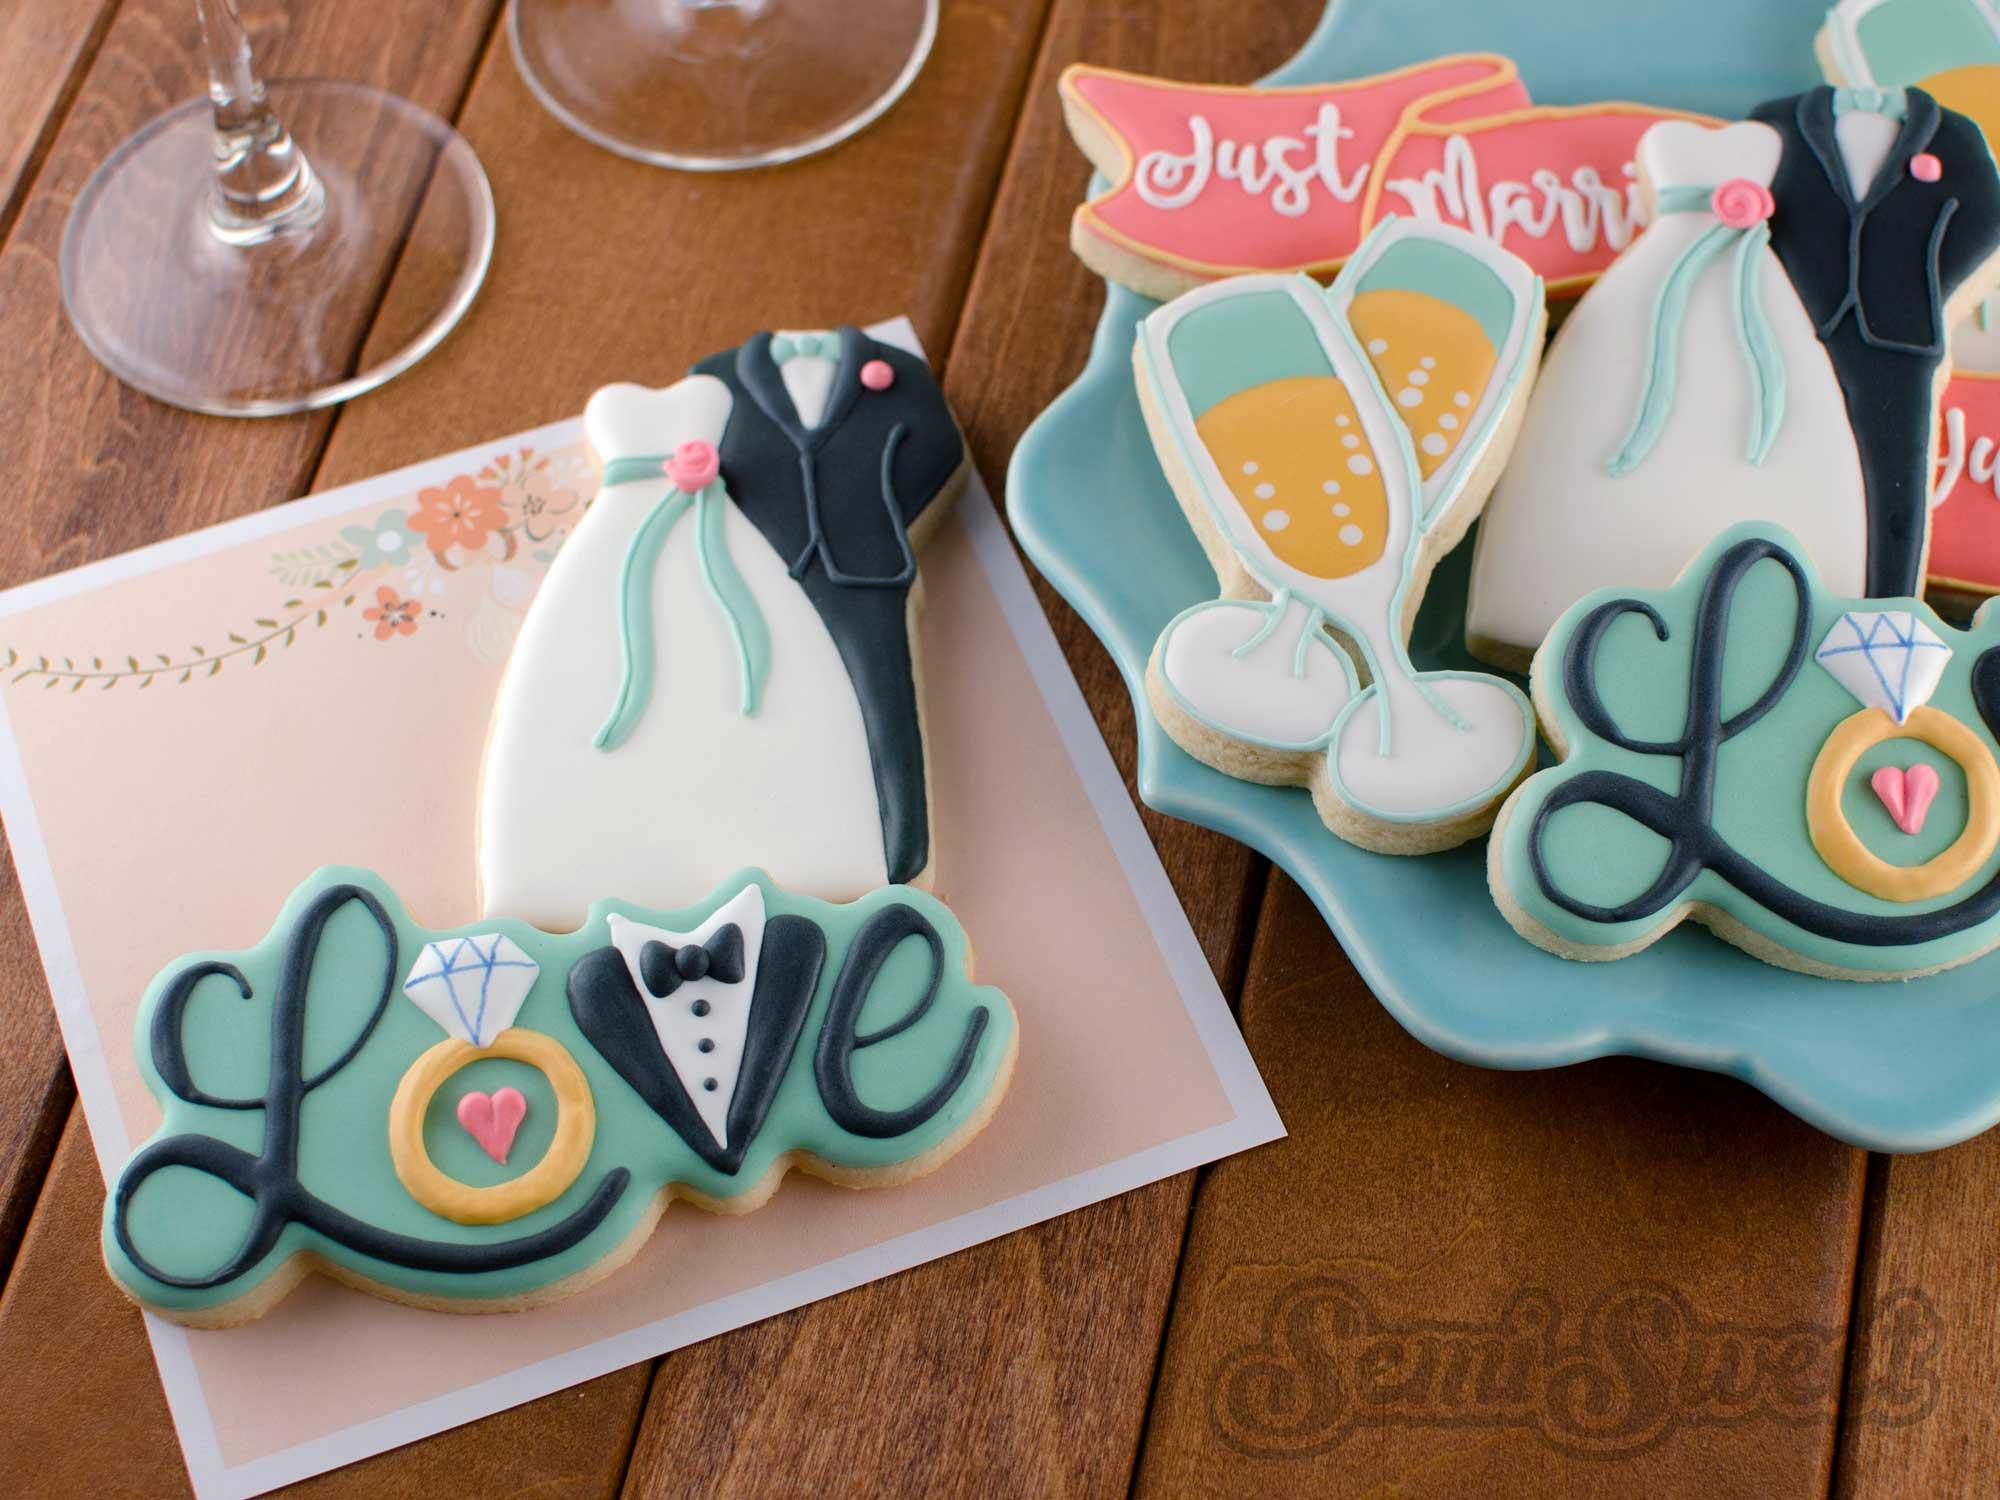 How to Make Wedding Love Cookies